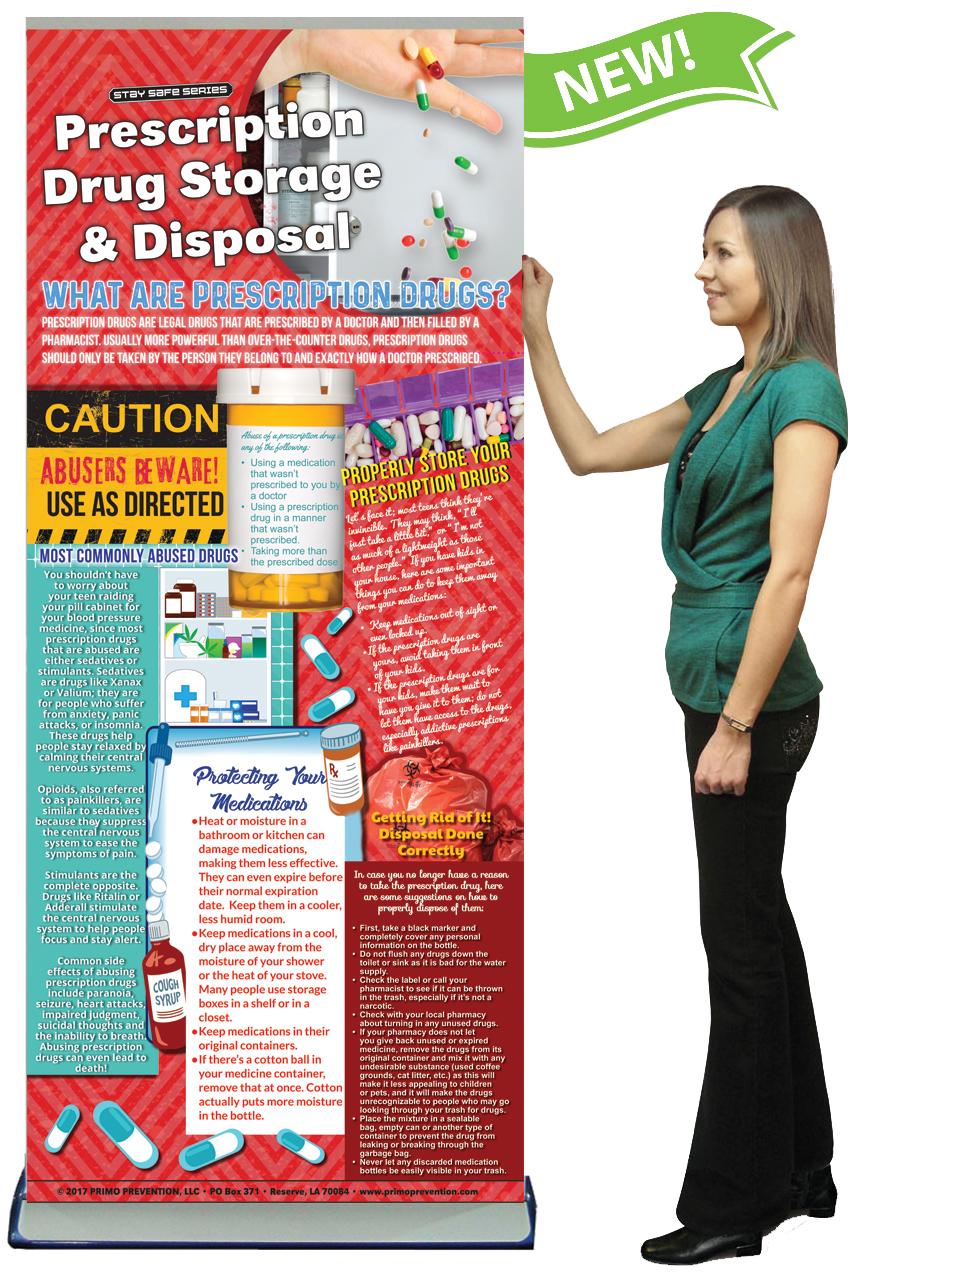 BAN-SS-24-Prescription-Drug-Storage-and-Disposal-NEW-LADY-WEB